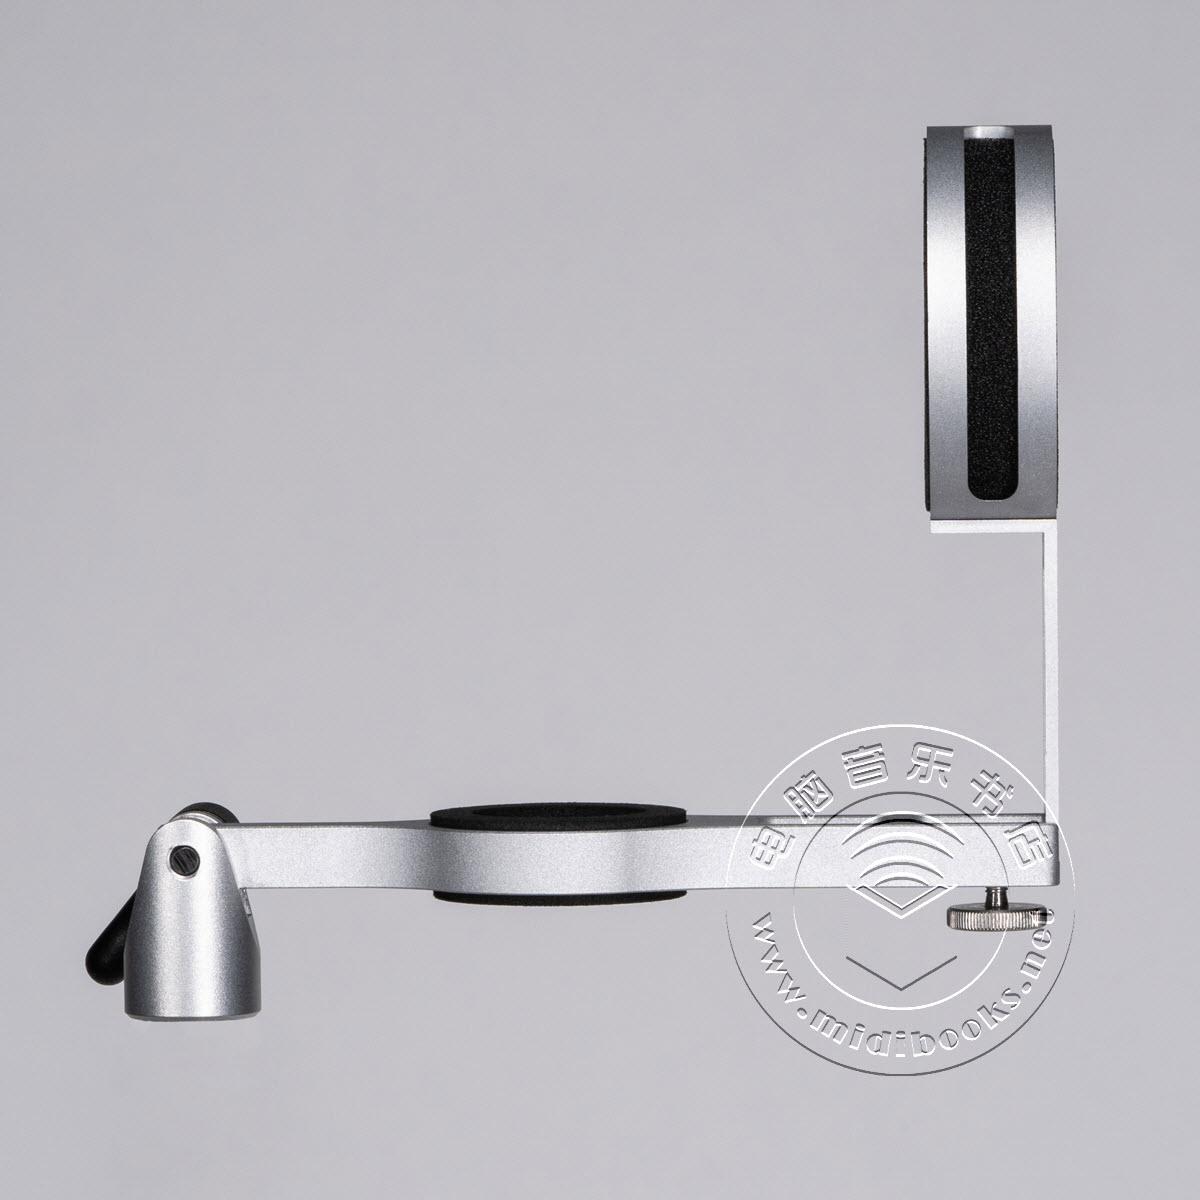 ISOVOX发布三角极头的专业人声录音电容话筒ISOMIC